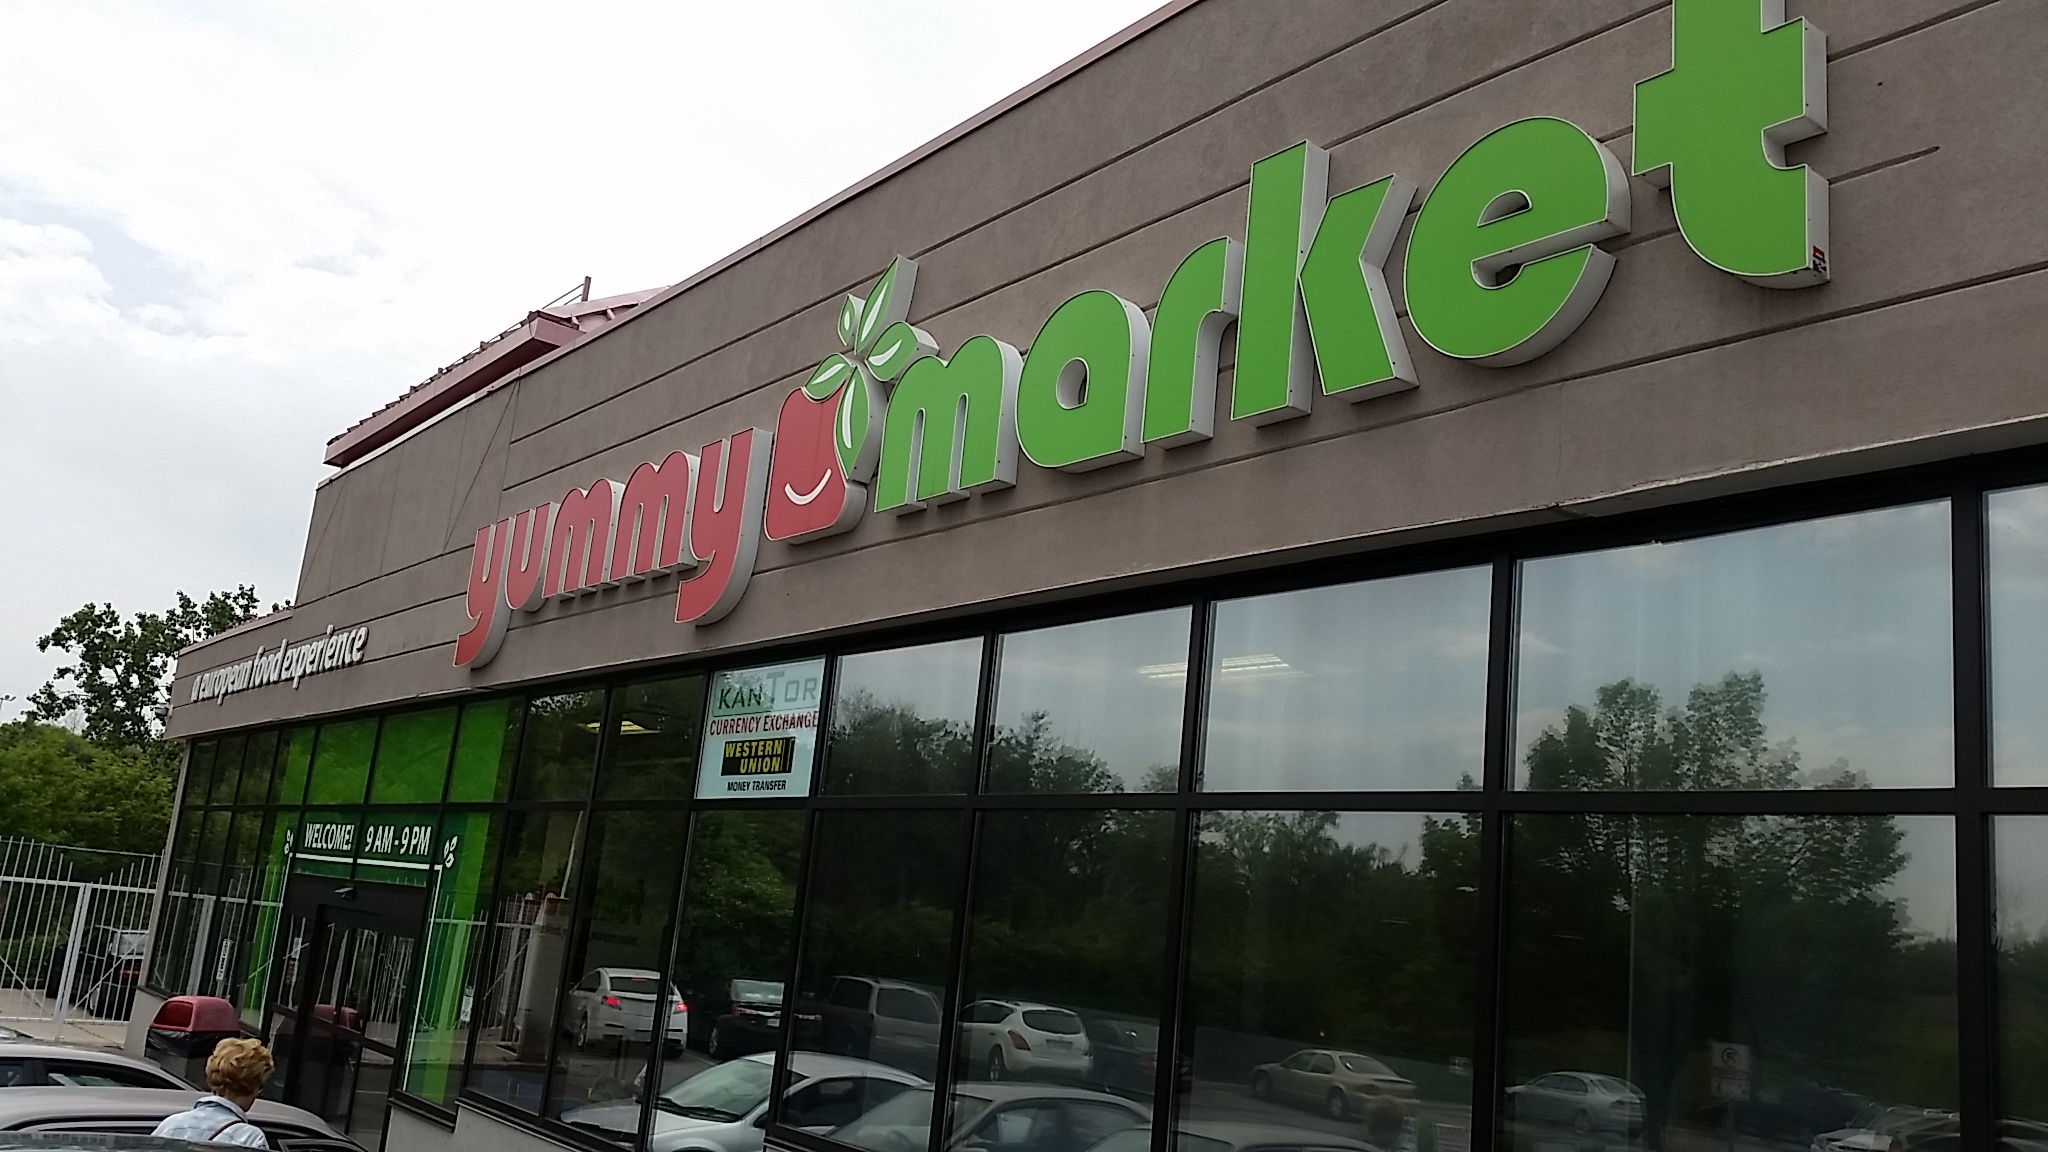 Yummy storefront